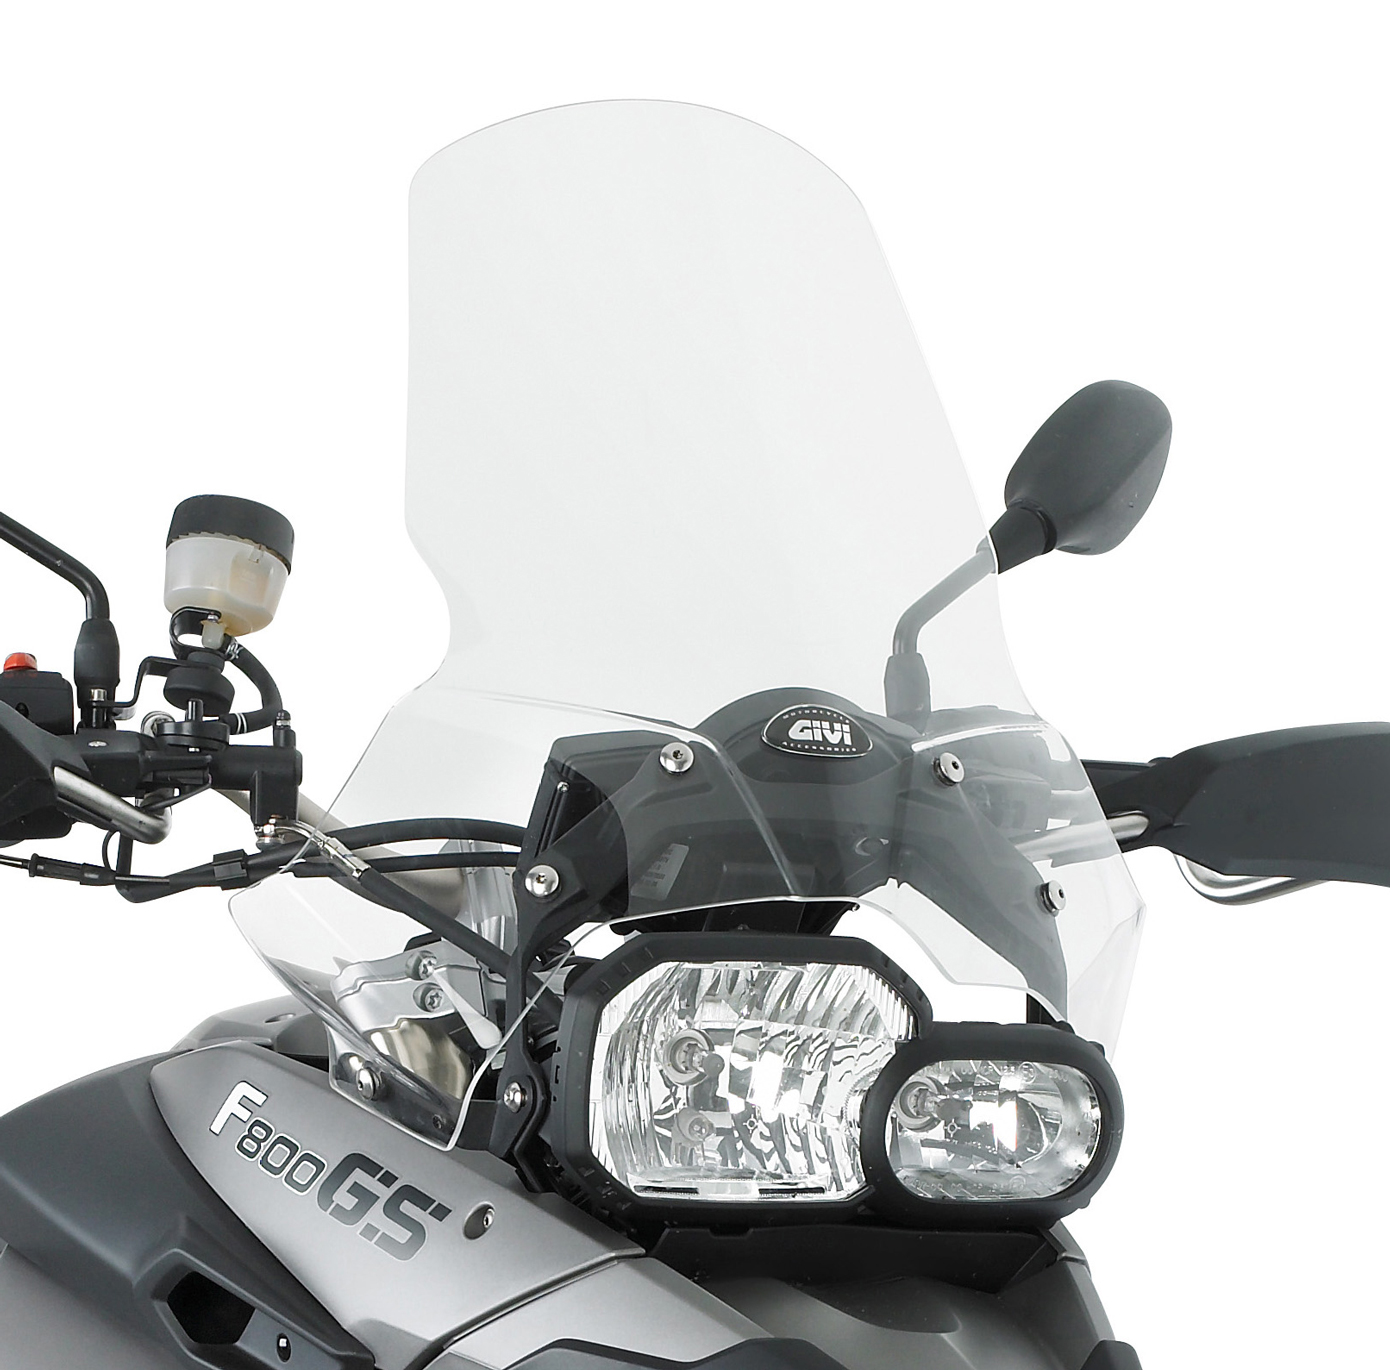 333DT Completo con enganches D333KIT Parabrisas Givi Compatible con BMW F 800 GS 2010